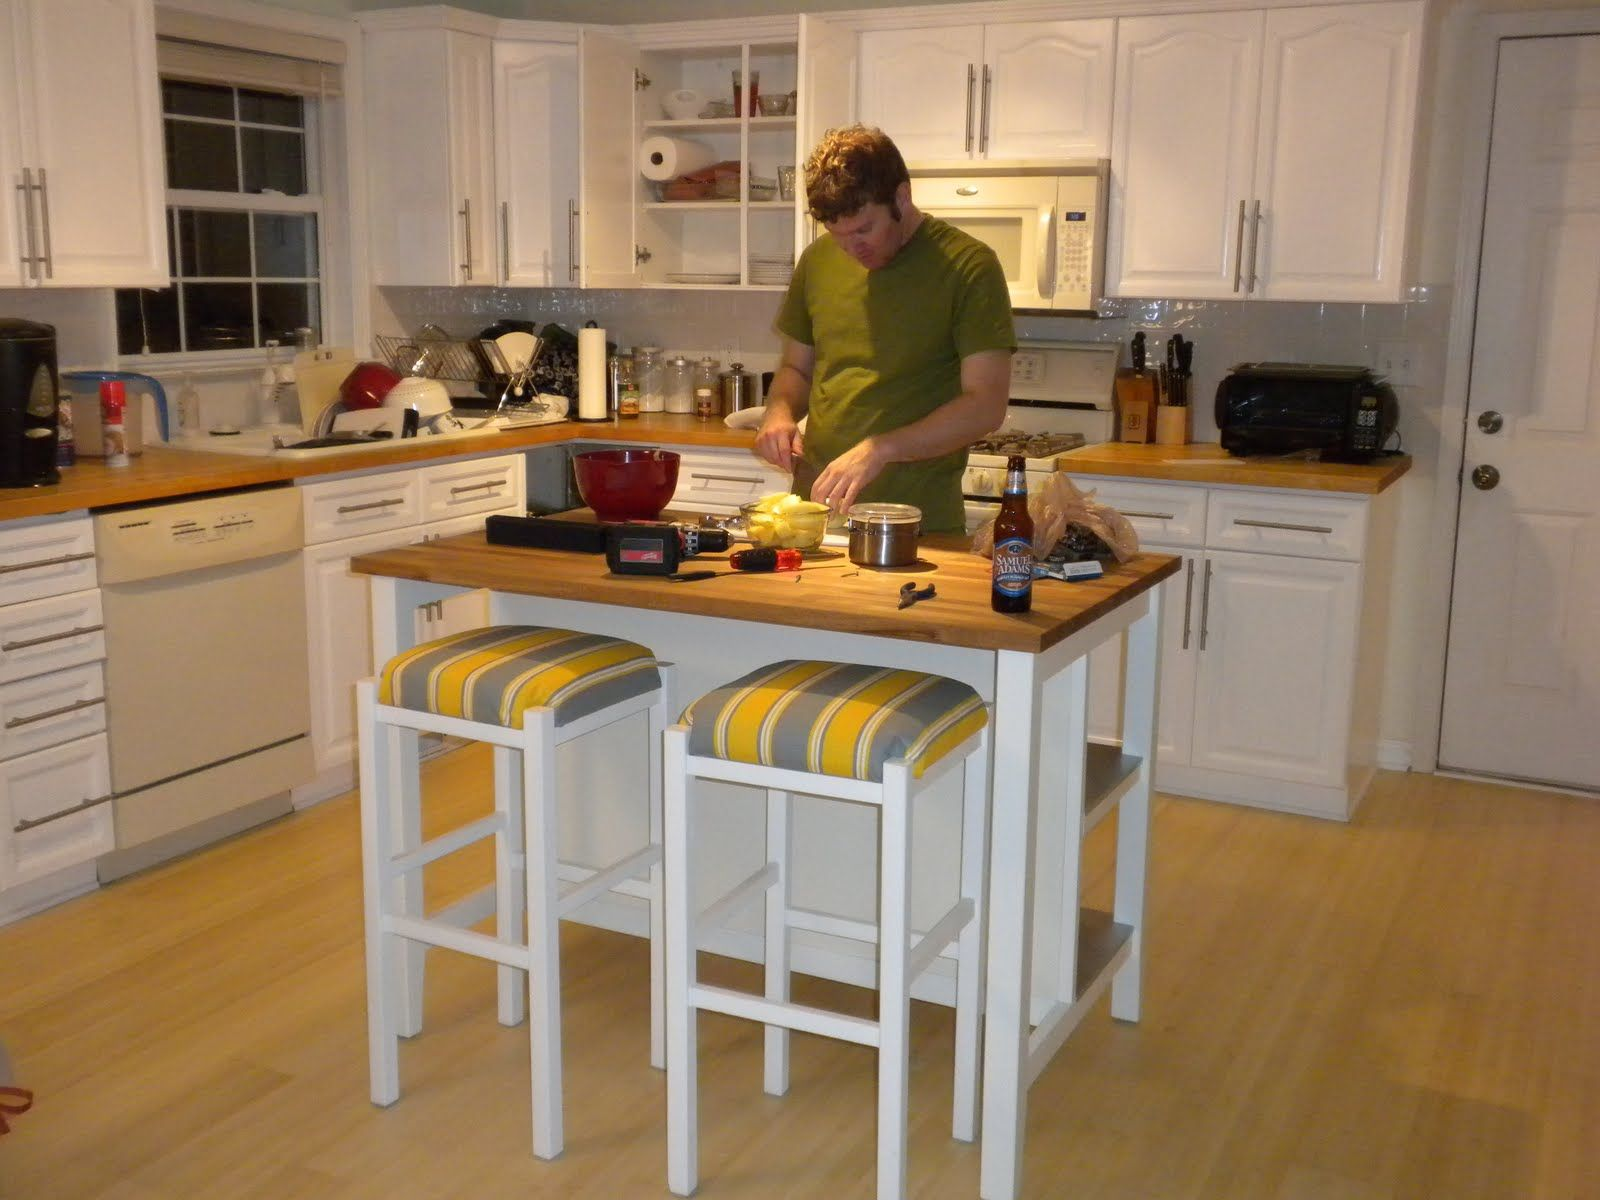 Ikea Kitchen Island Base Bloomfield A Kitchen Remodel Pinterest